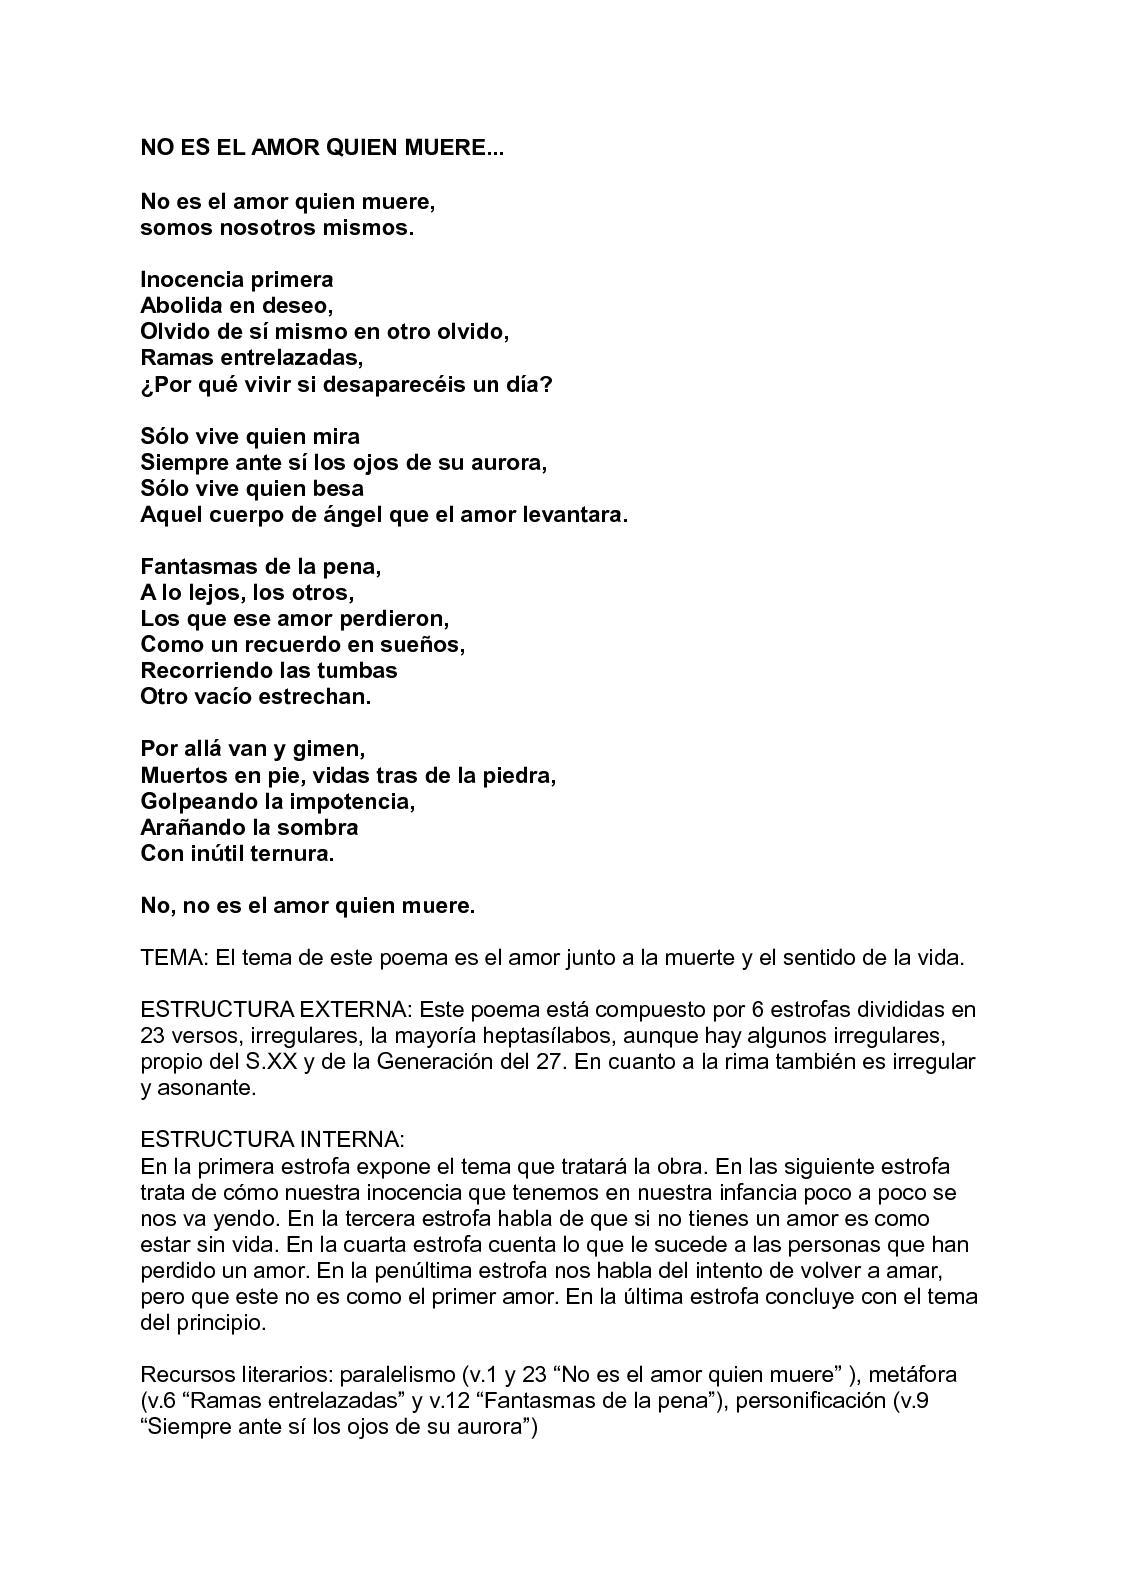 Calaméo Poema Luis Cernuda